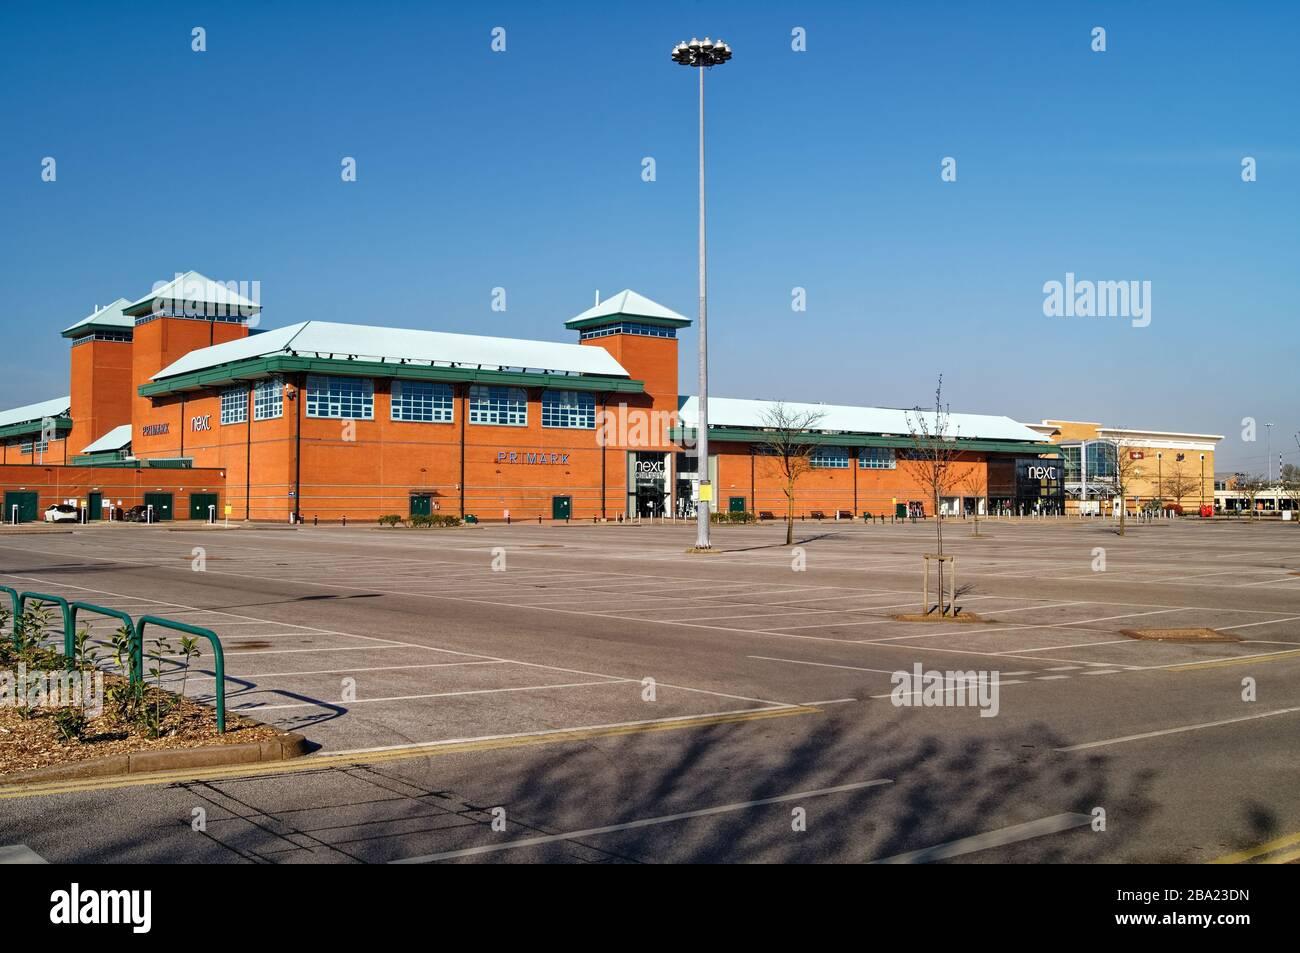 Royaume-Uni, Yorkshire du Sud, Sheffield, Meadowhall Shopping Center avec parking vide pendant 2020 Covid 19 Lock Down Banque D'Images